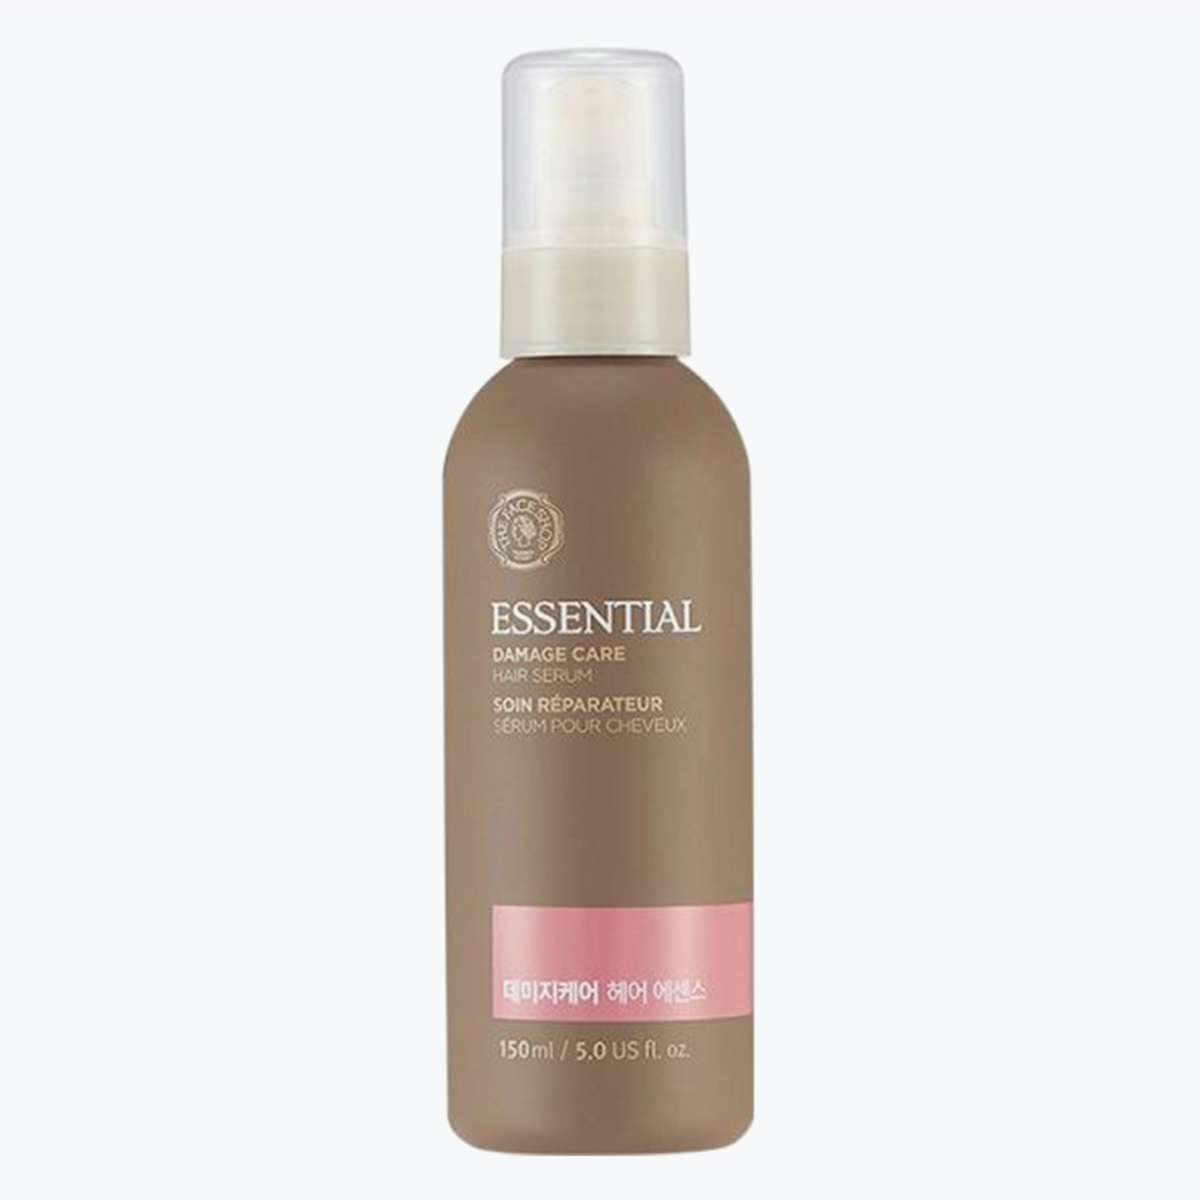 THE FACE SHOP Essential Damage Care Hair Oil Serum